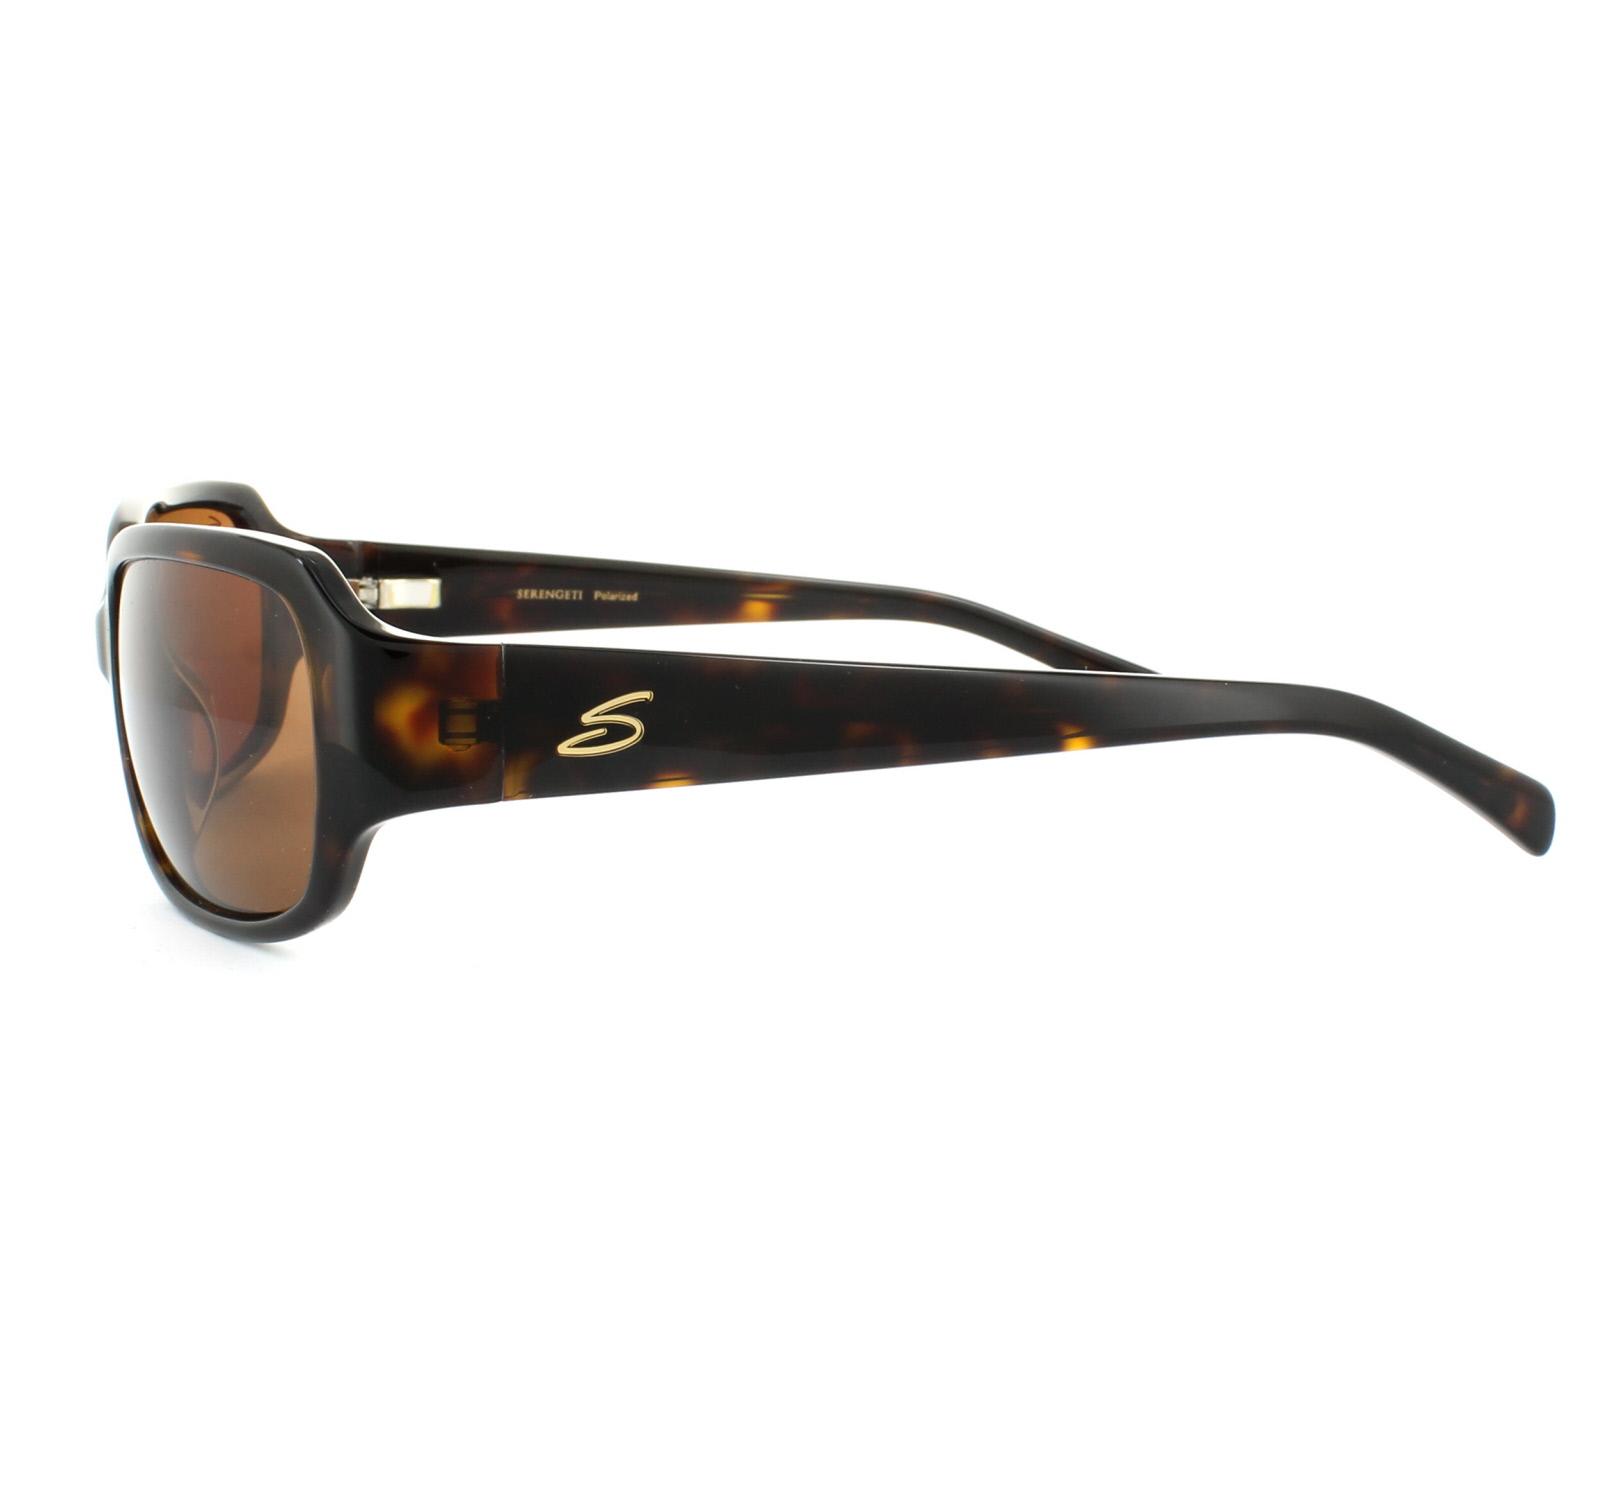 9ba5937d6f Sentinel Serengeti Sunglasses Annalisa 7962 Tortoise Drivers Brown Polarized